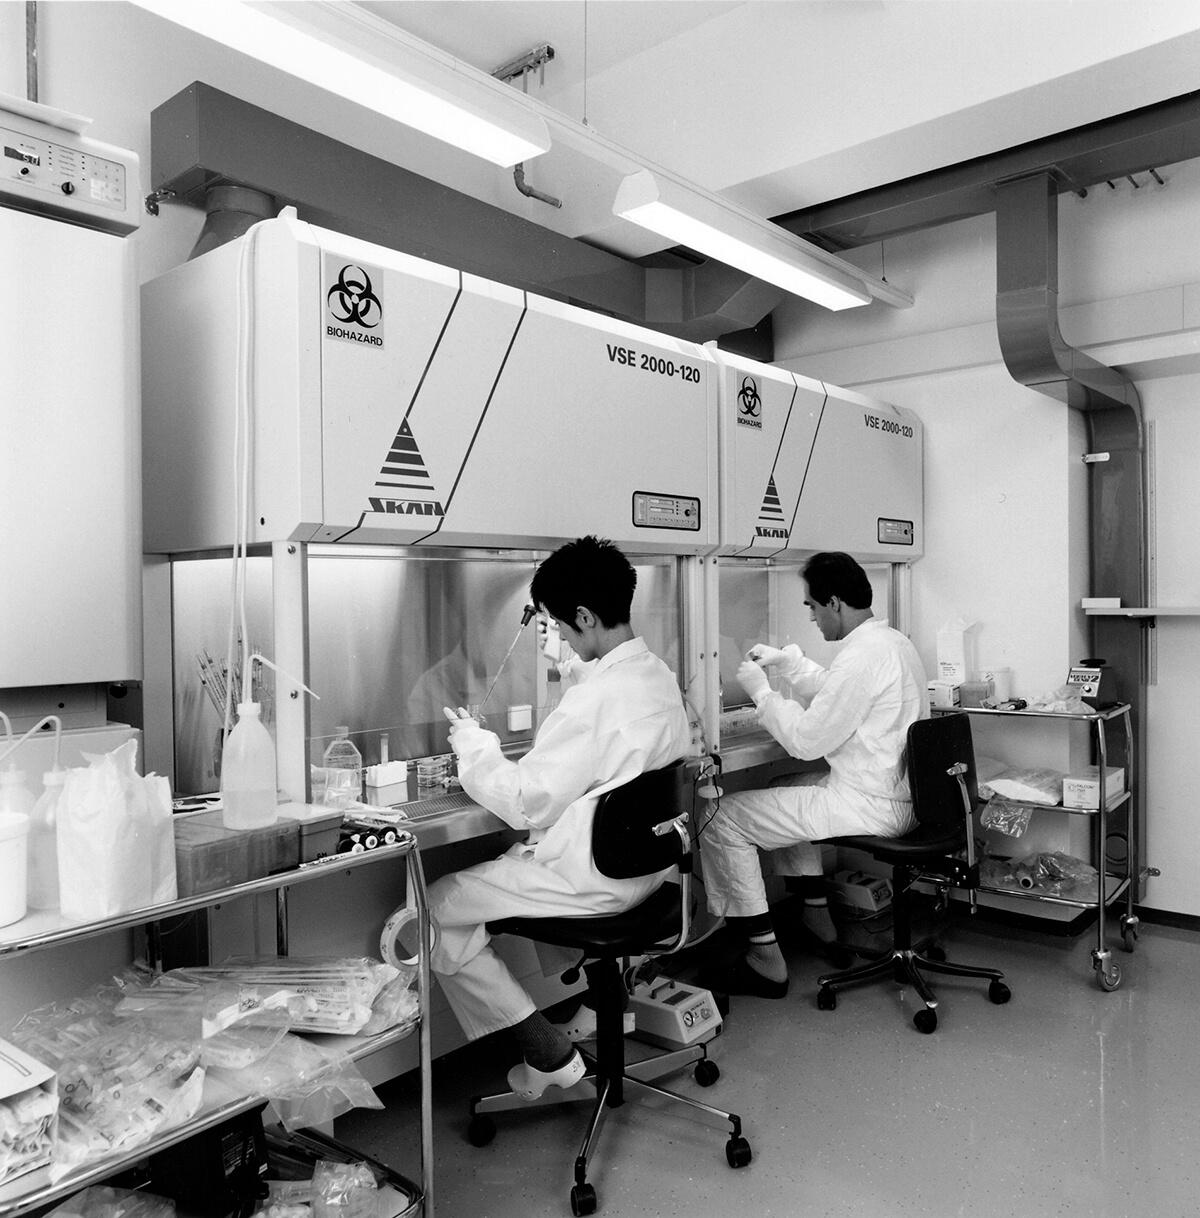 IMUCHUV Institut de microbiologie universitaire Rue du